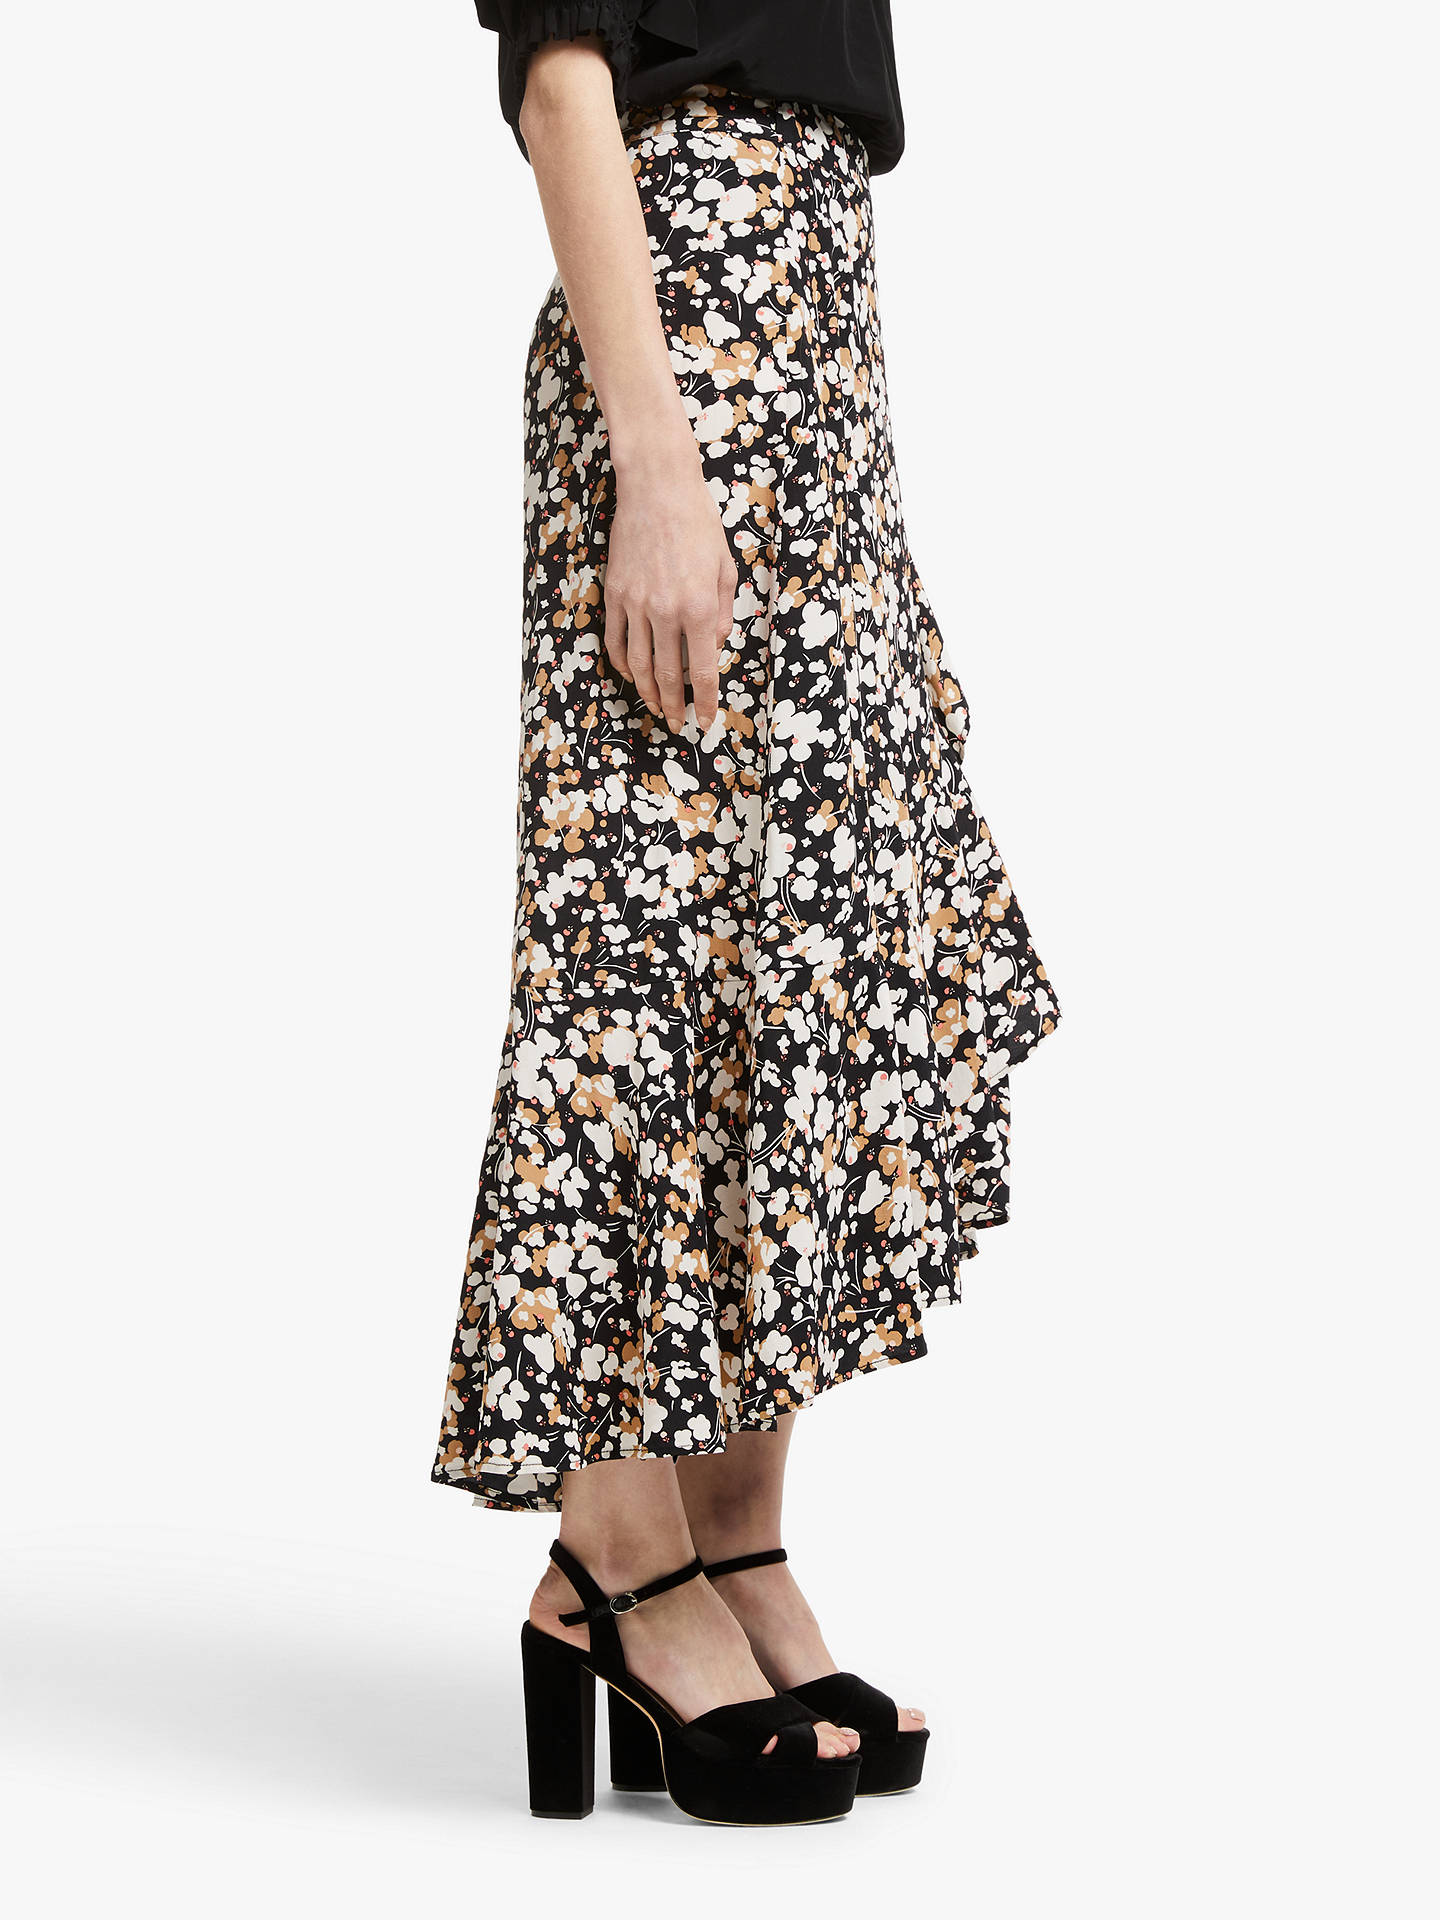 17b6fc8f3626 ... Buy Somerset by Alice Temperley Dapple Apple Frill Wrap Skirt,  Black/Neutral, 10